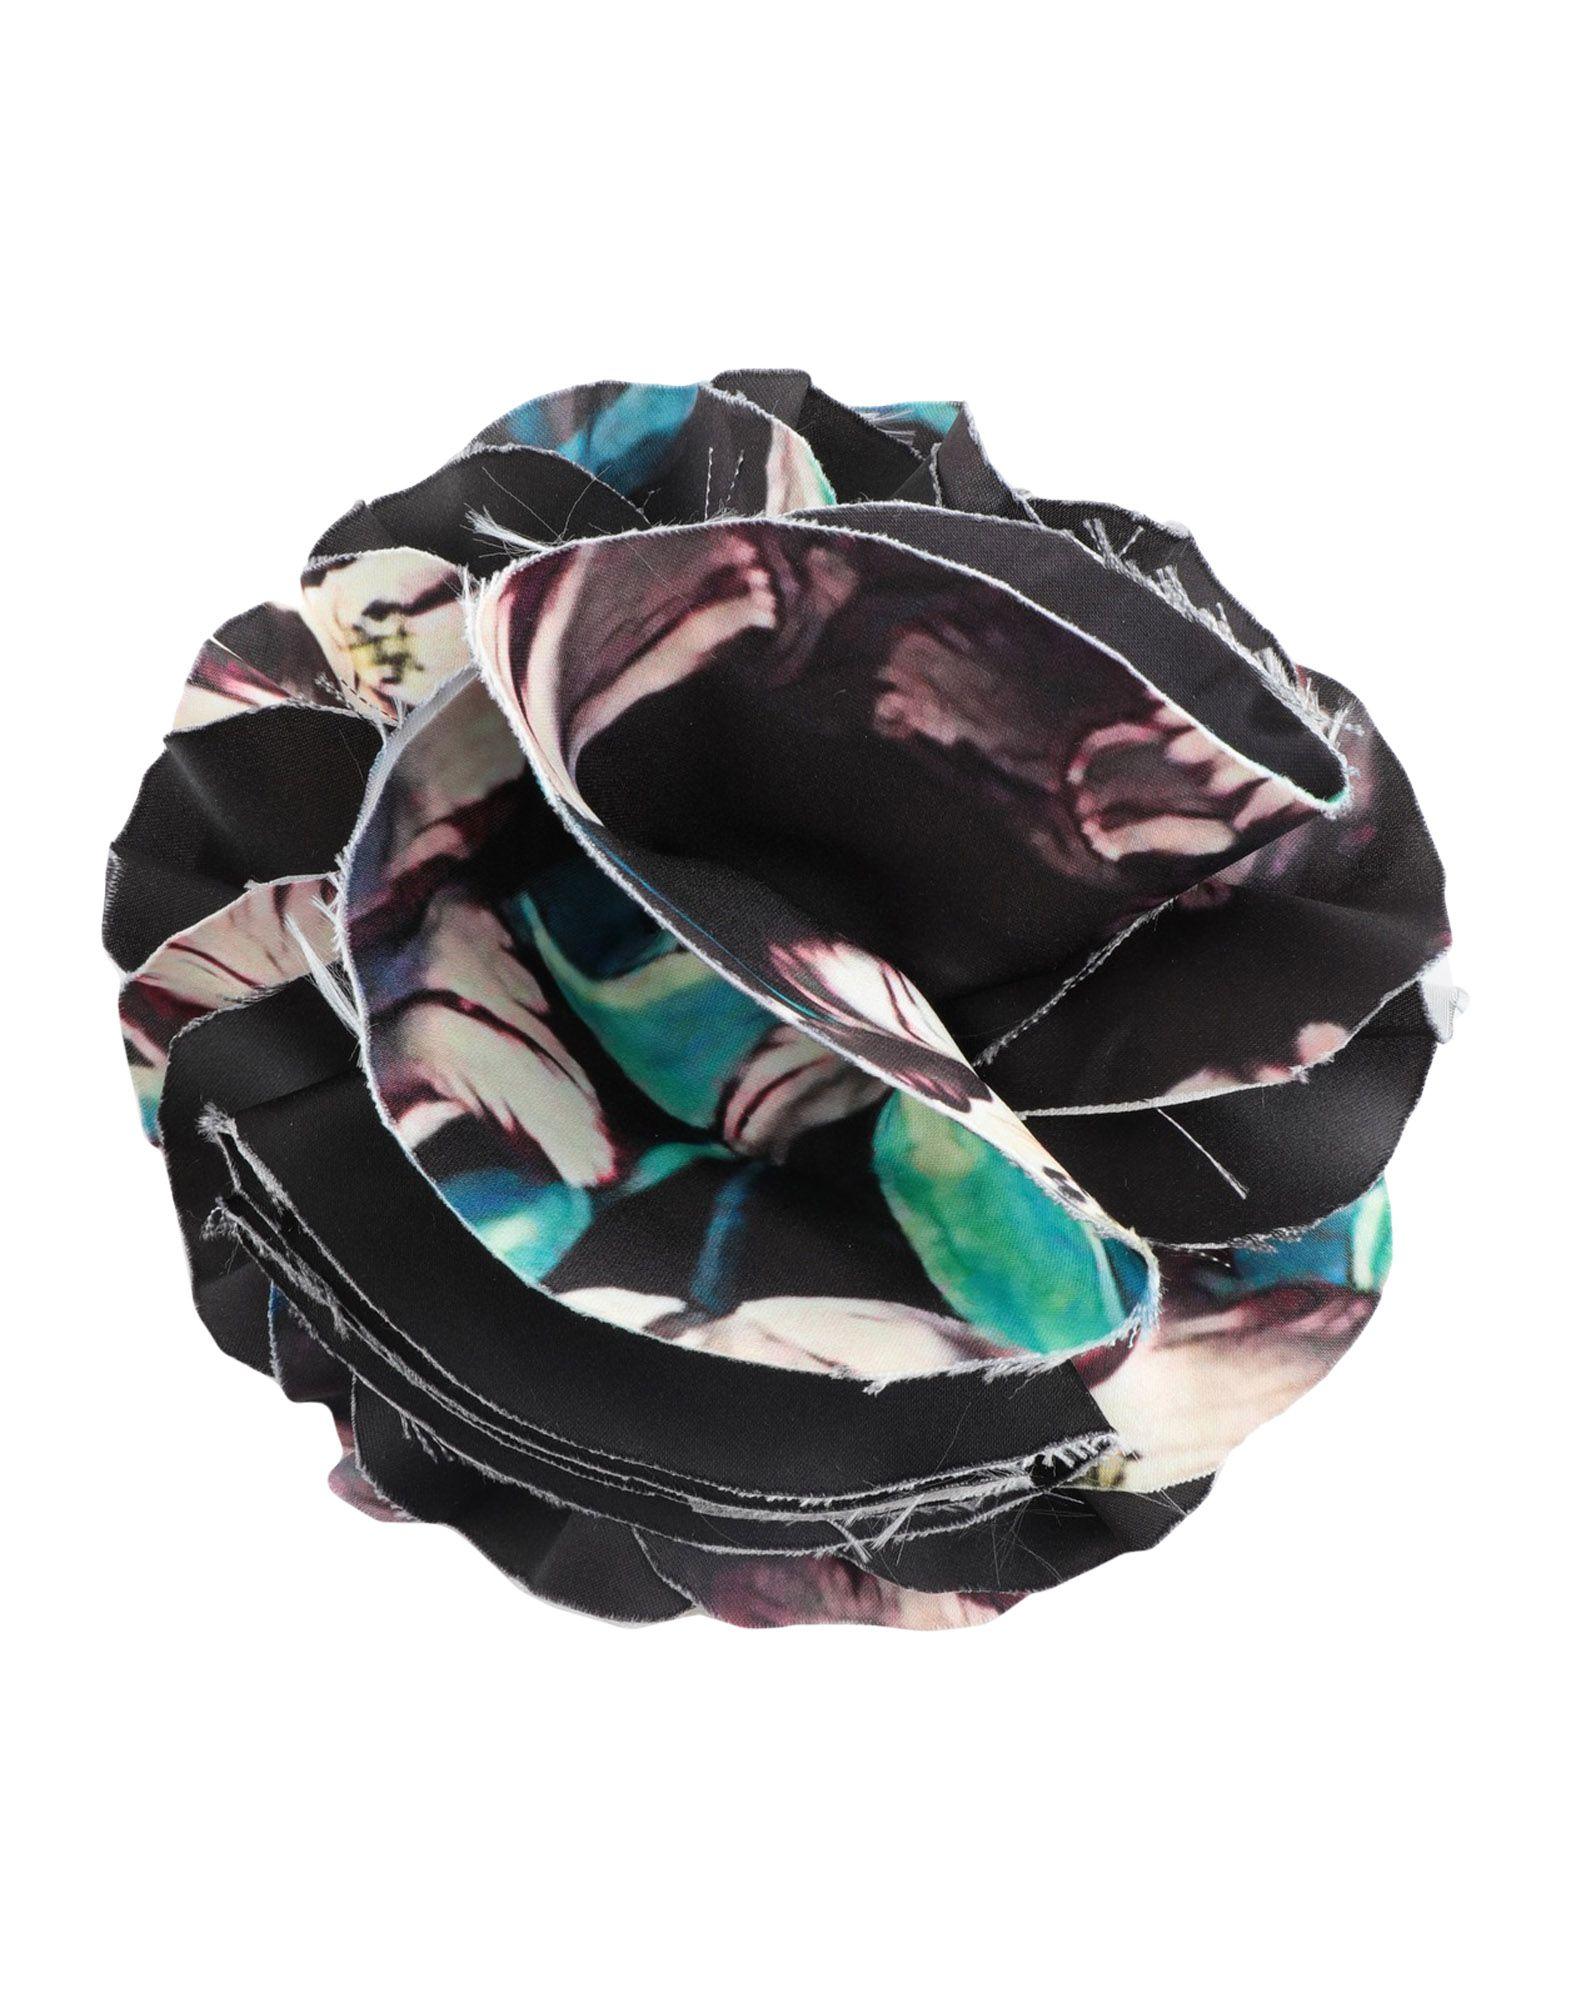 YOOX.COM(ユークス)《セール開催中》GIADA CURTI RESORT レディース ブローチ ブラック 紡績繊維